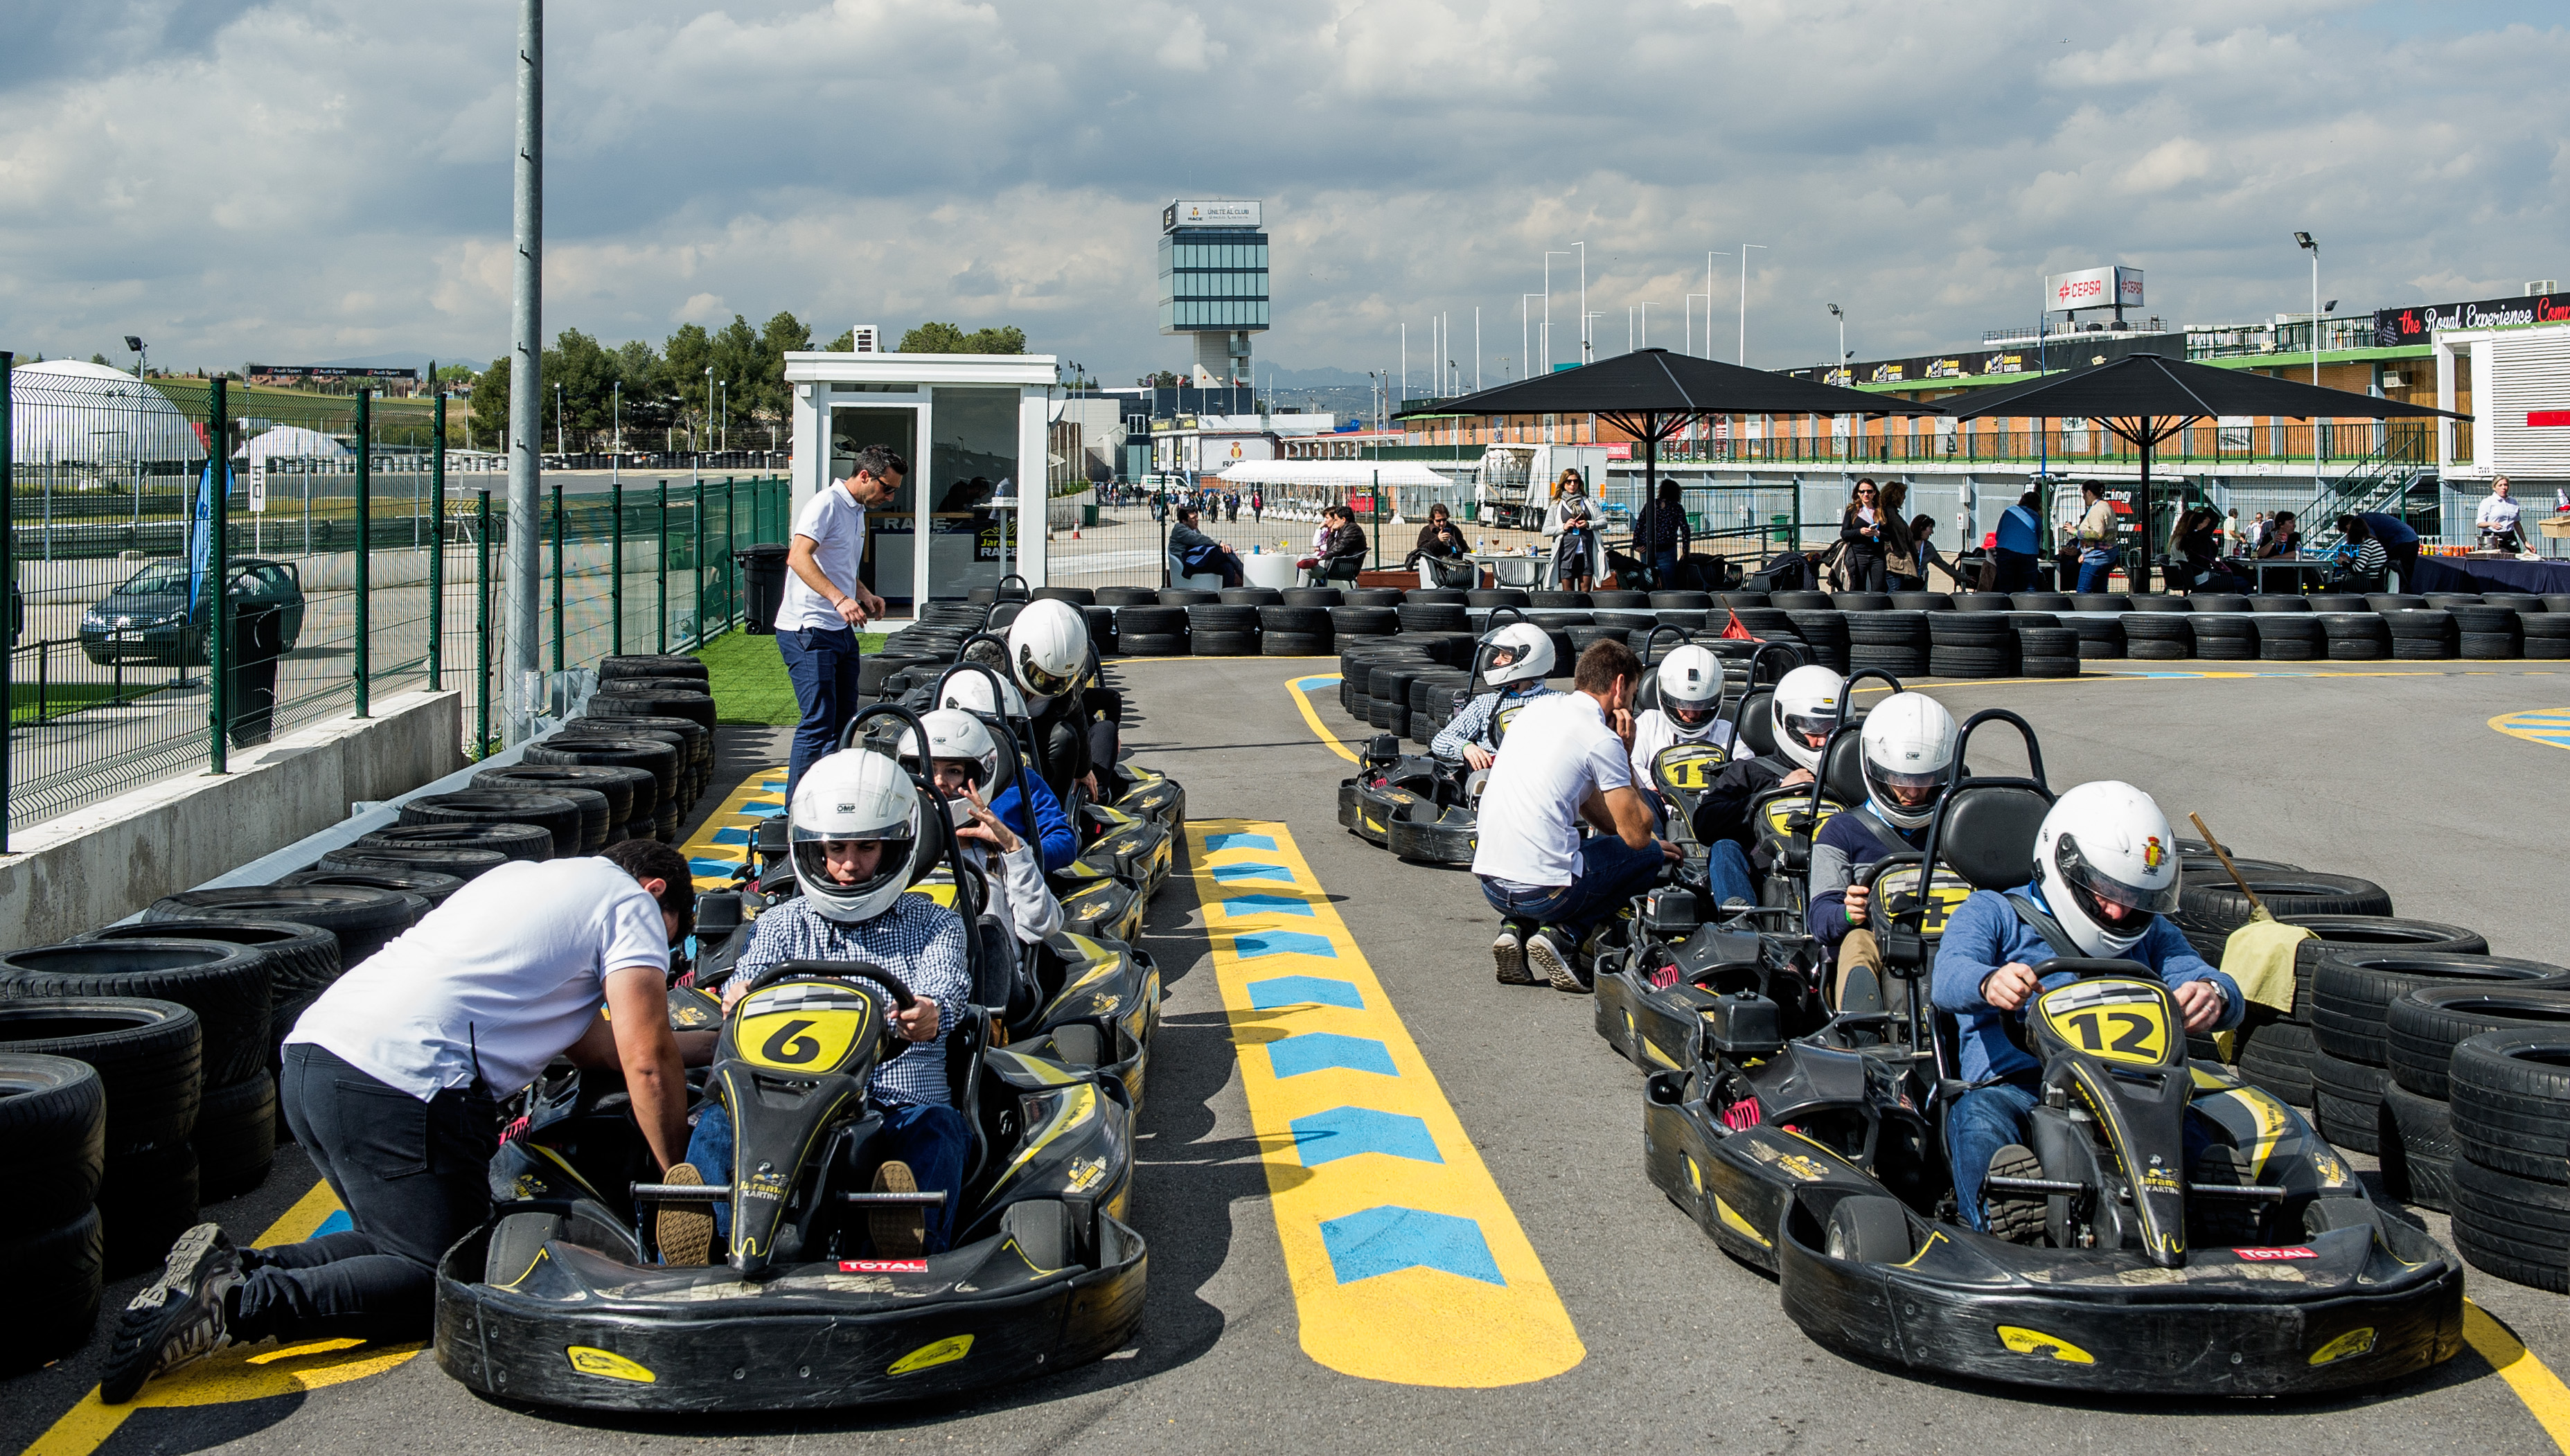 Circuito del Jarama Karting - Karting